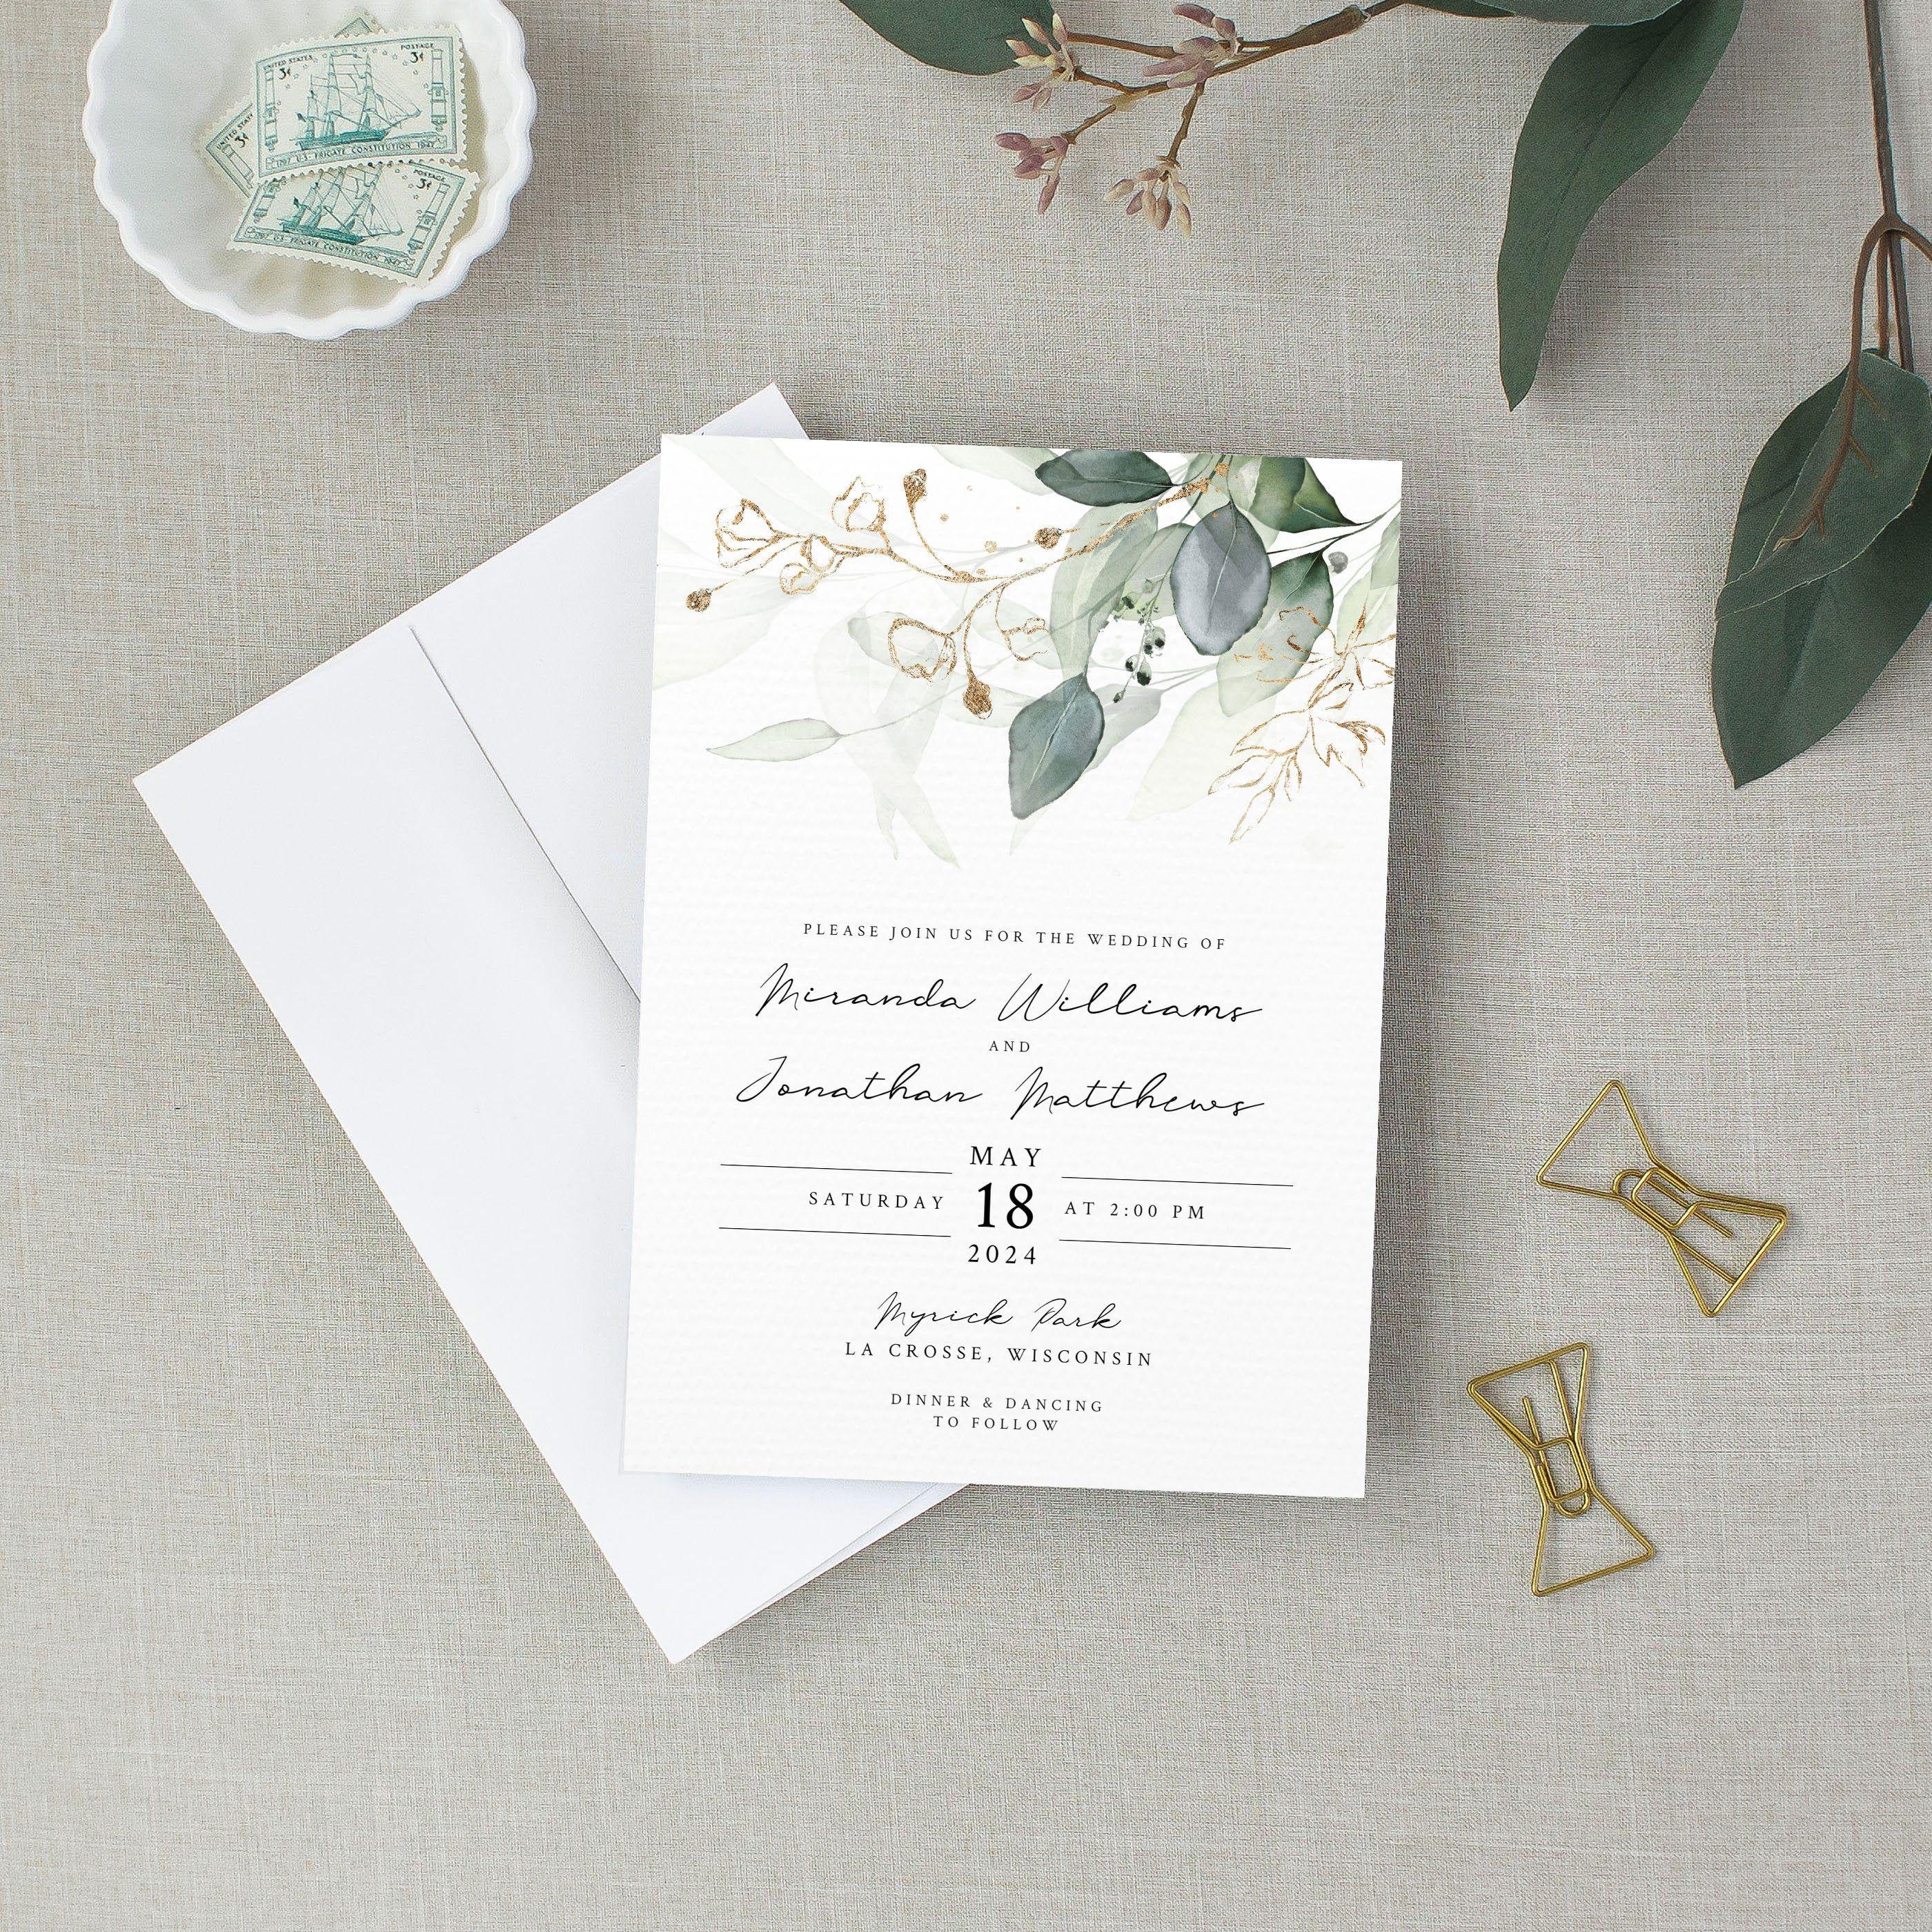 Wedding Invitation Set Template Eucalyptus Bohemian Etsy Wedding Invitations Wedding Invitation Sets Eucalyptus Wedding Invitation